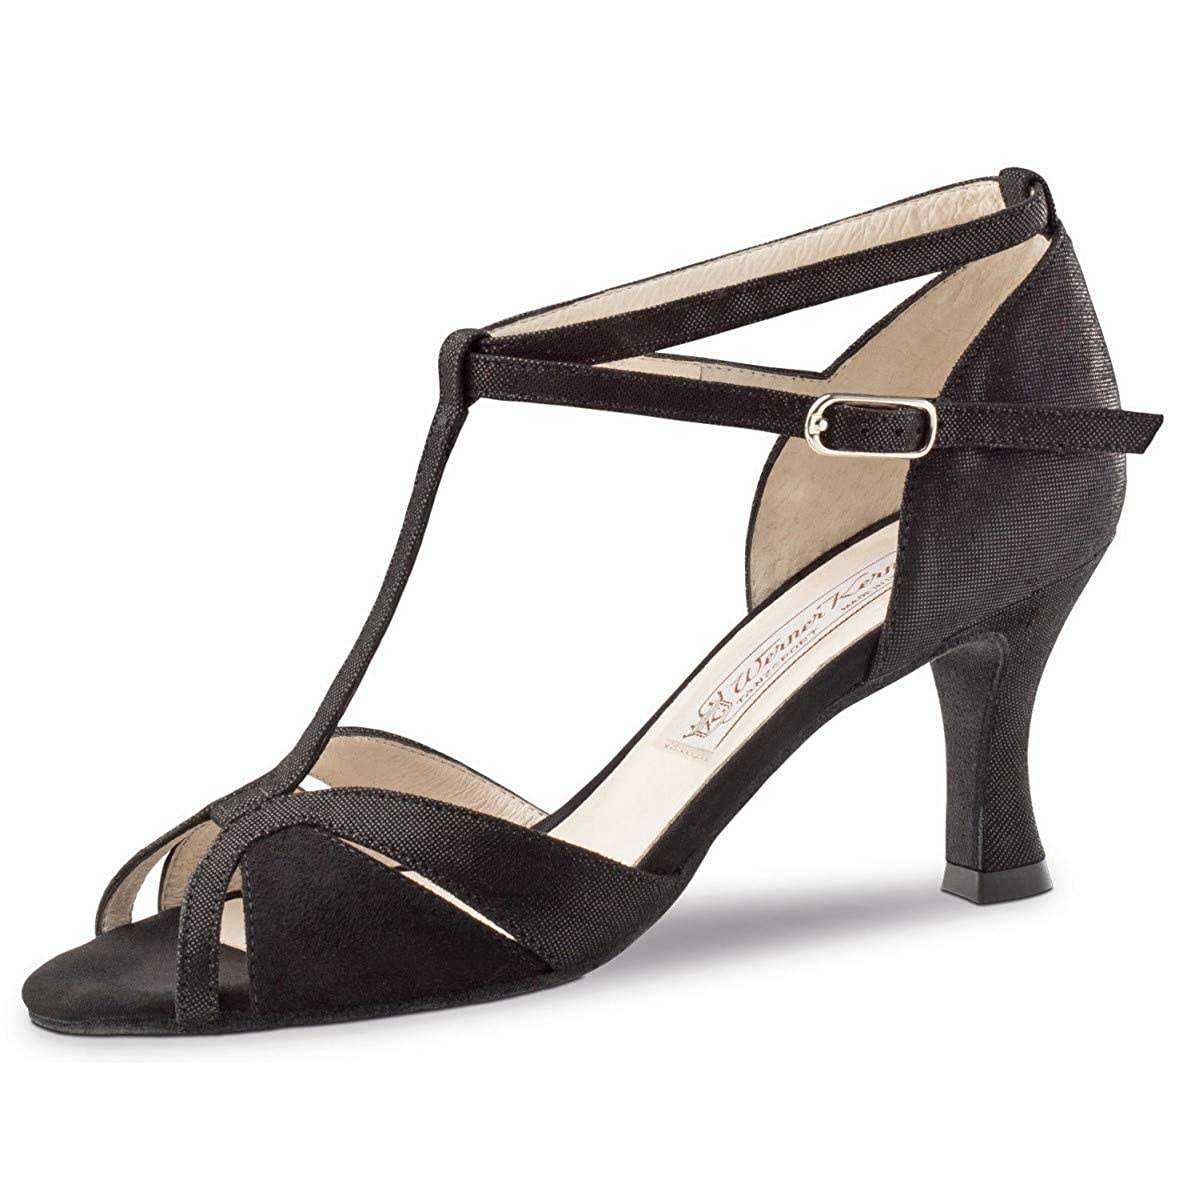 Chaussures Noir Étroit Werner 6 Ida De Danse Femmes Suéde Kern 29WEYbHeDI